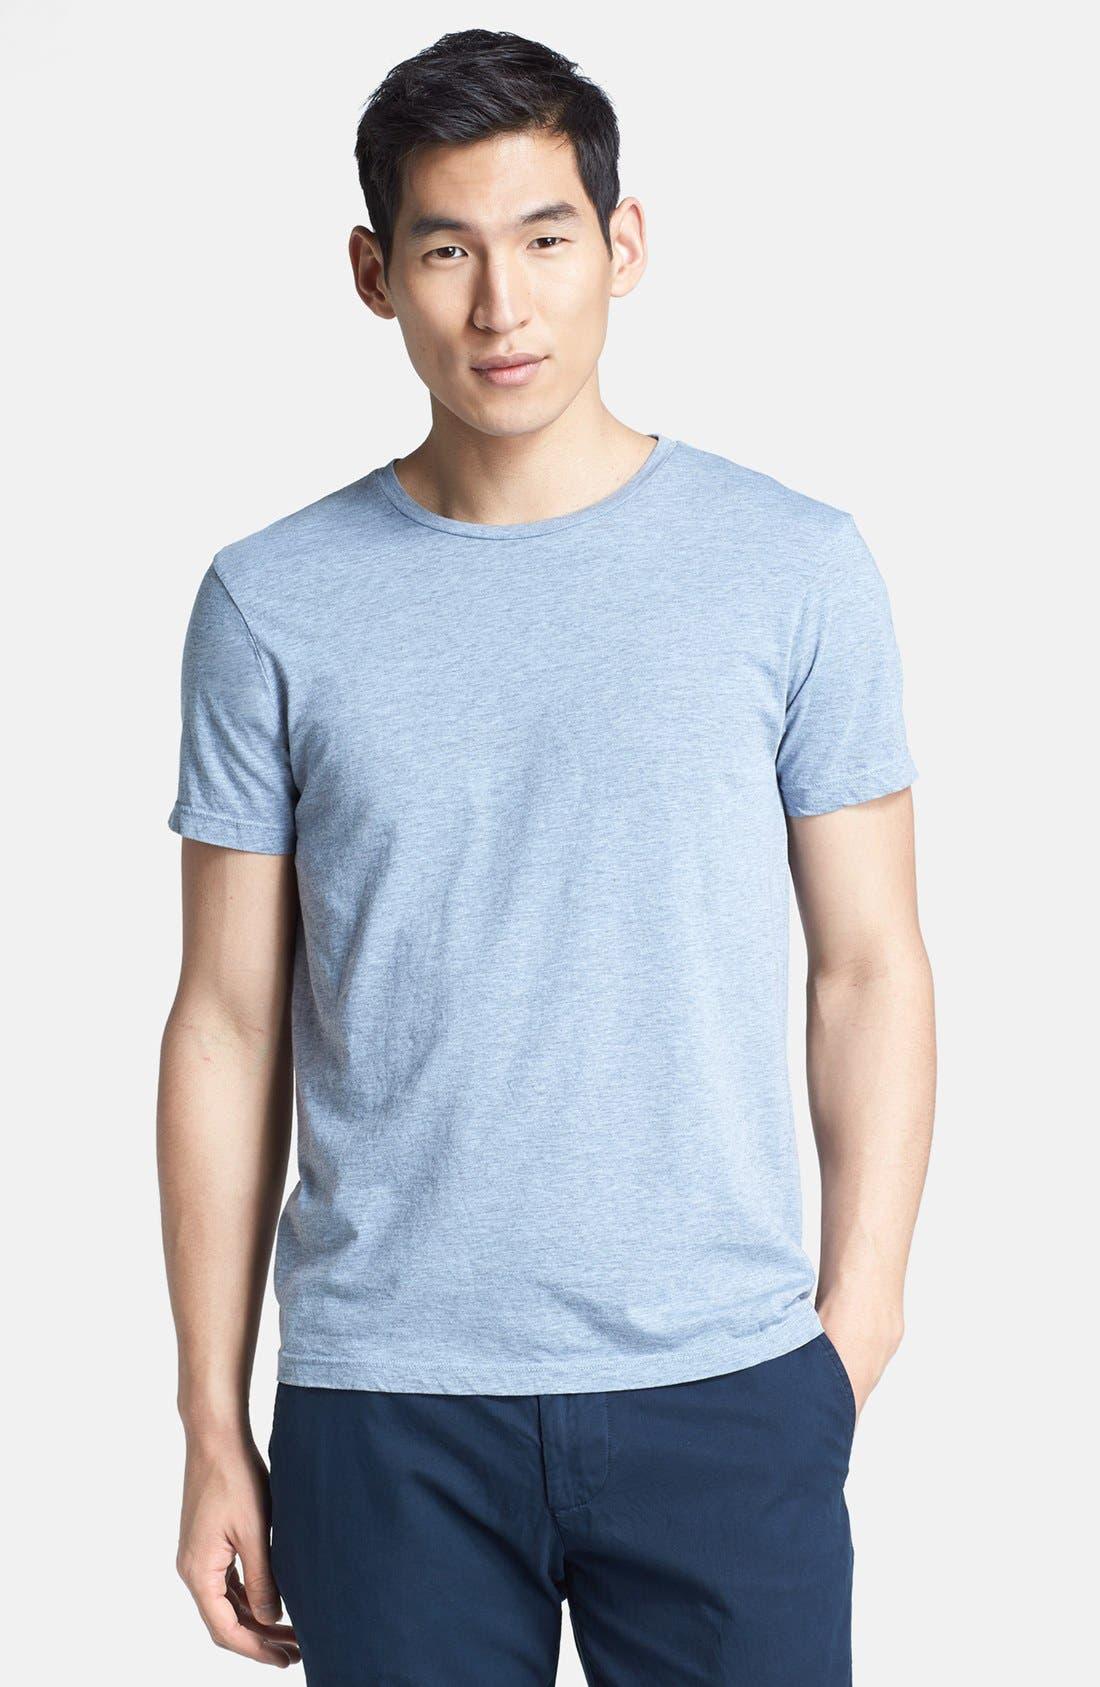 Main Image - Save Khaki Crewneck T-Shirt